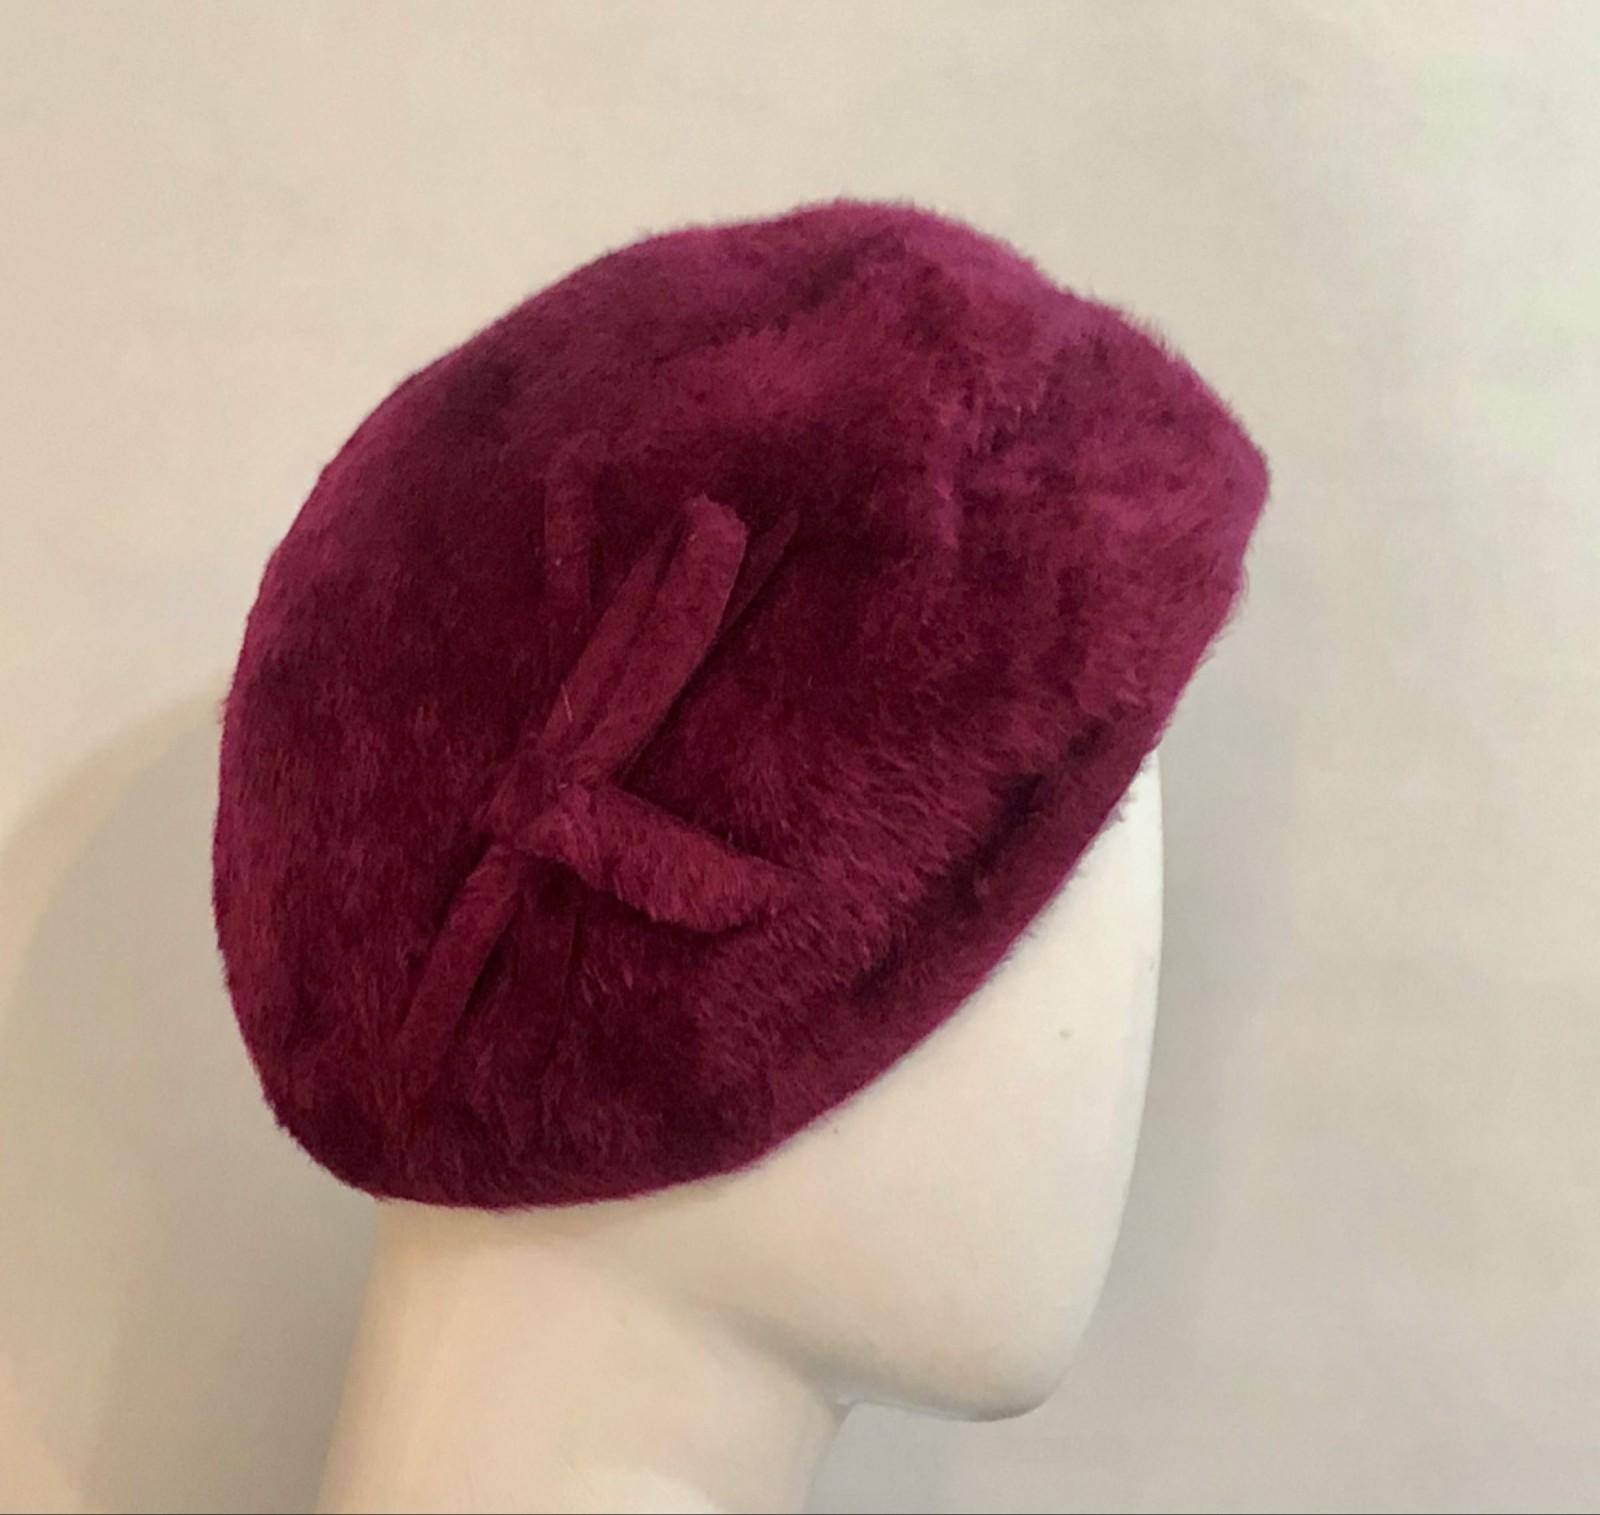 6f1fb142a8 Raspberry beret - Milliners  Guild